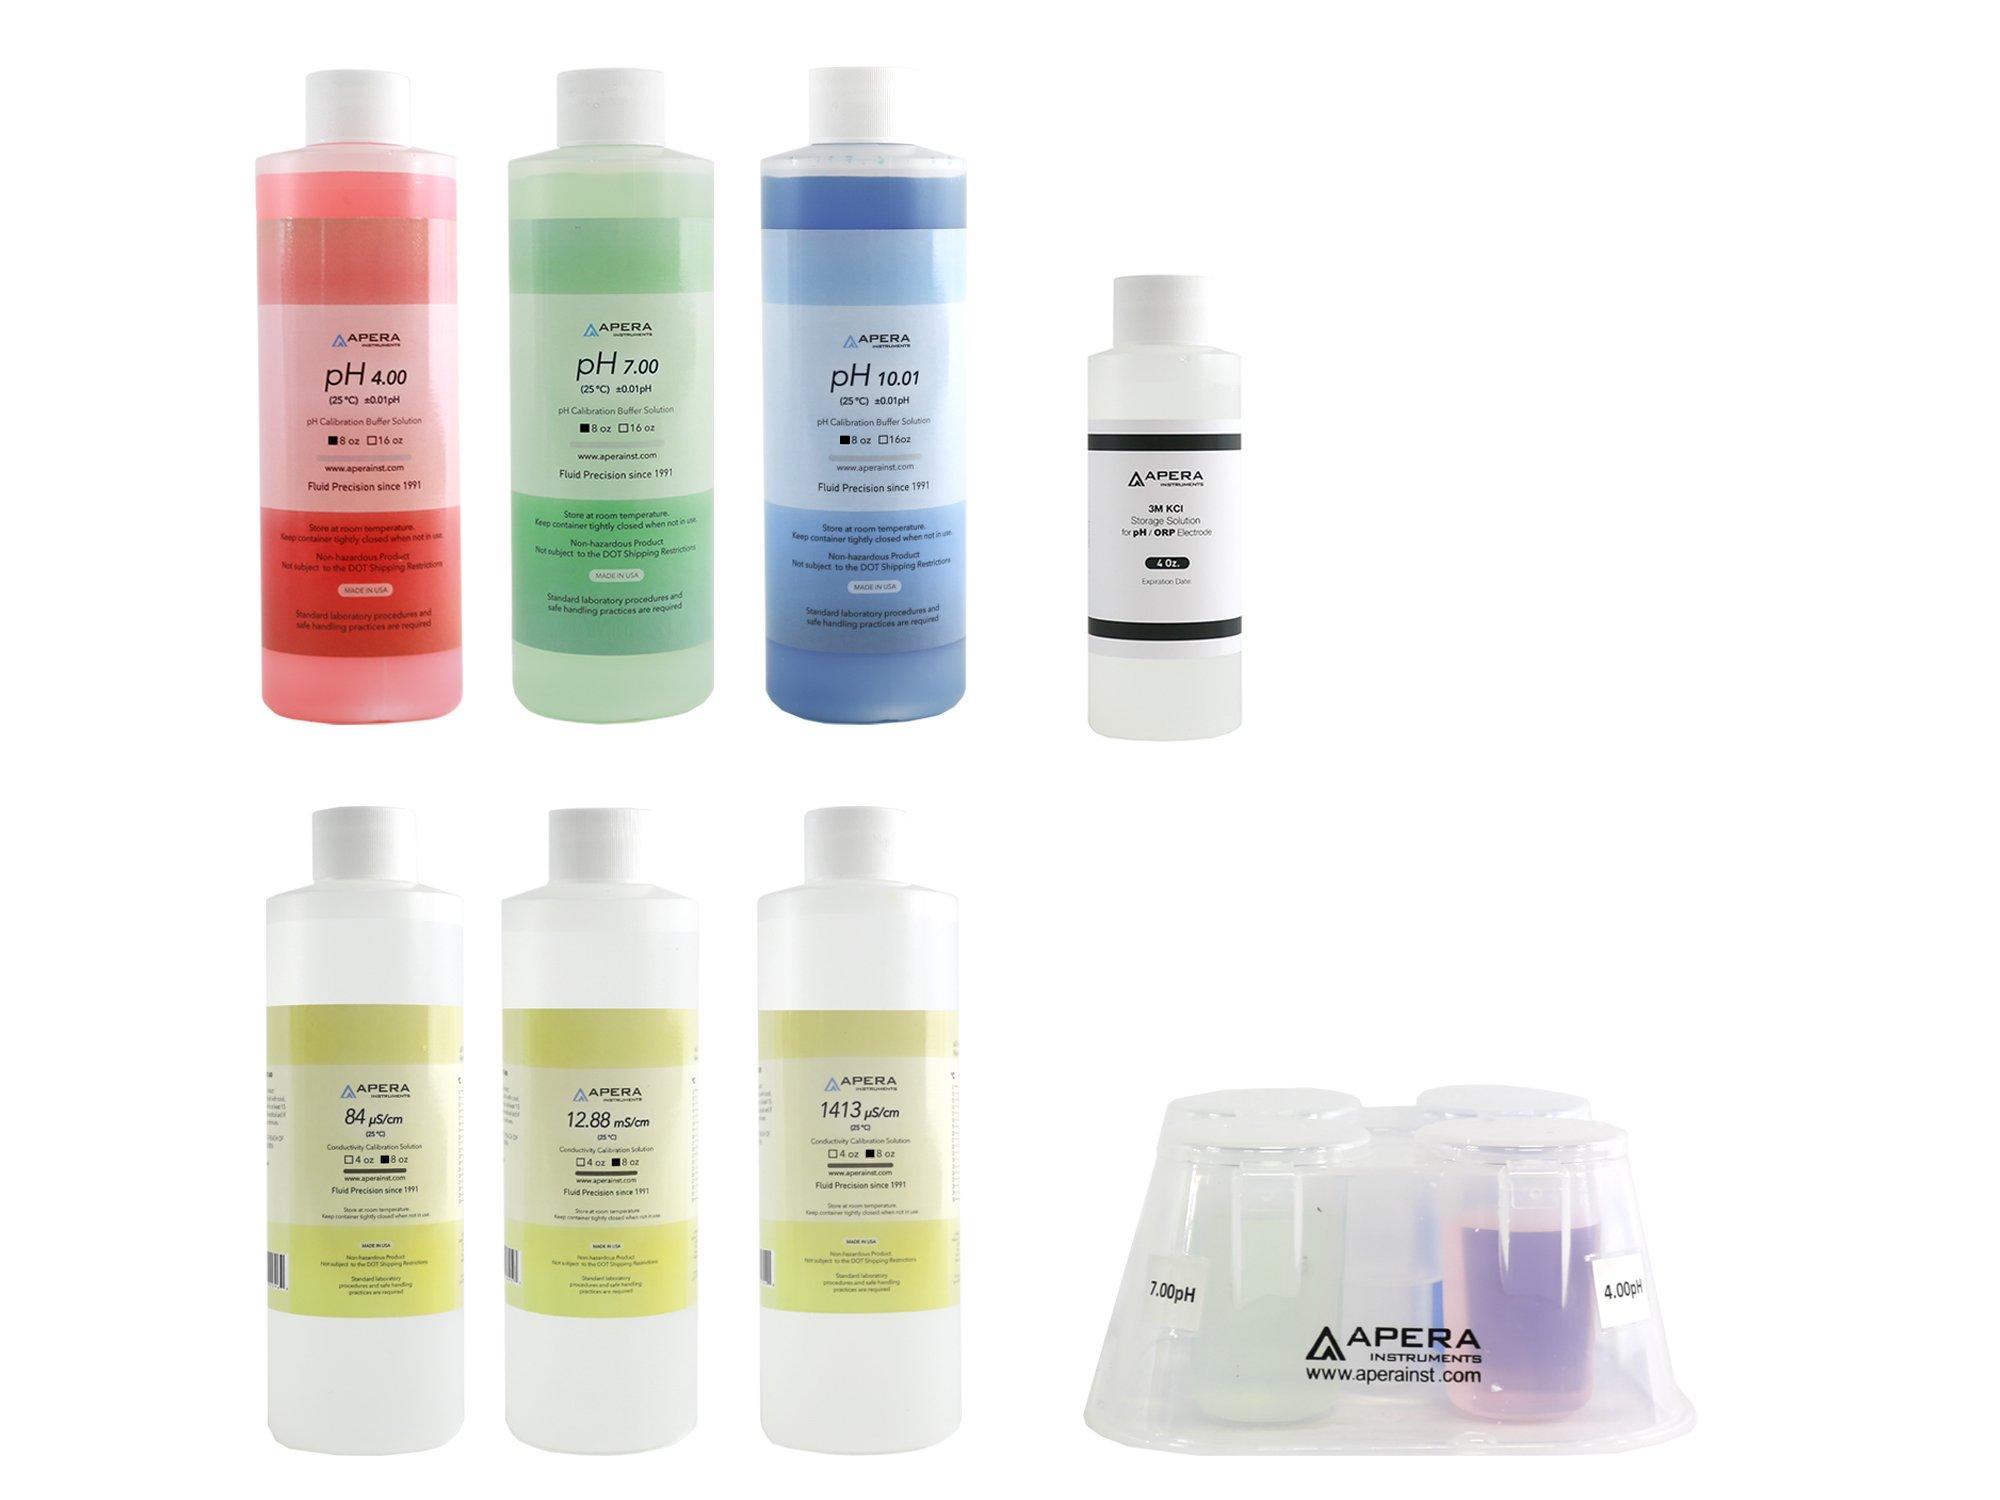 8oz. pH/EC Calibration Solution Kit (pH 7.00, 4.00, 10.01, 1413 µS, 12.88 mS, 84 µS), plus Storage Solution & CalBox